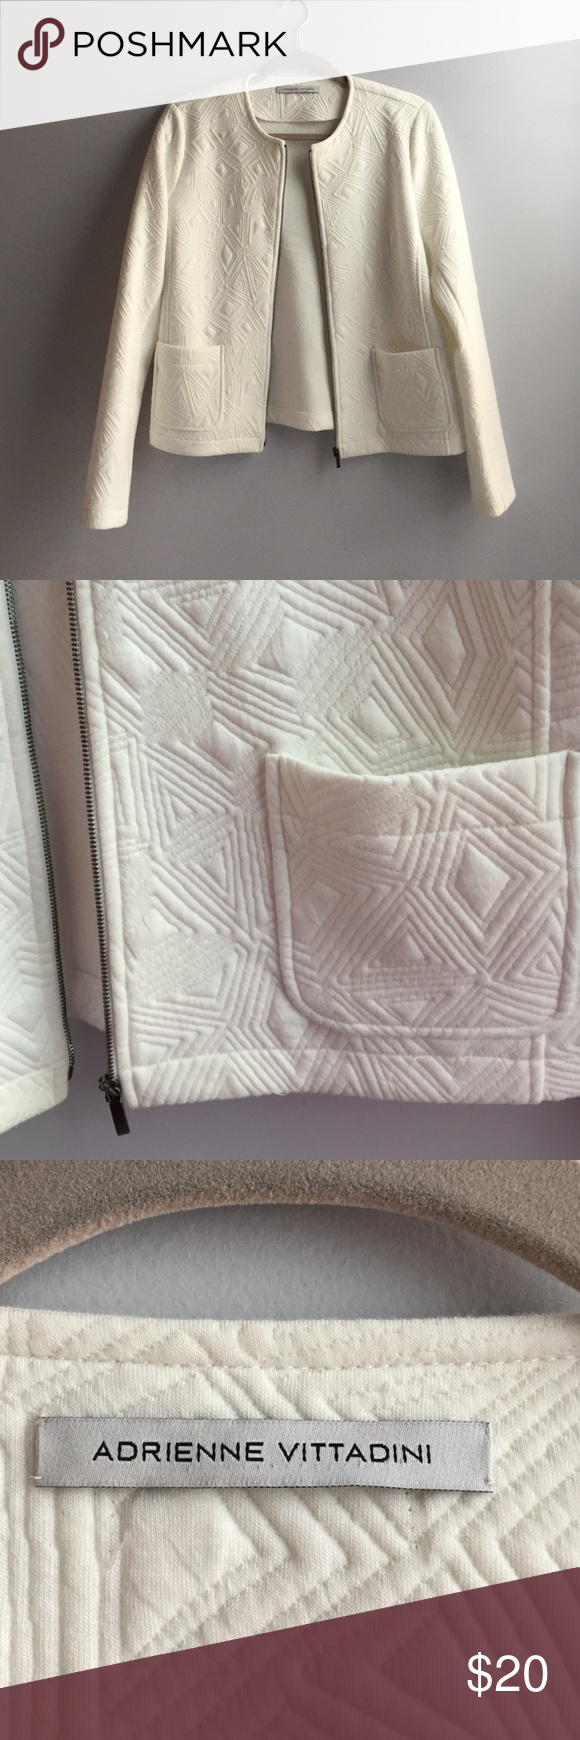 Adrienne Vittadini Textured Knit Jacket AV knit textured jacket with zip and pockets Adrienne Vittadini Jackets & Coats Blazers